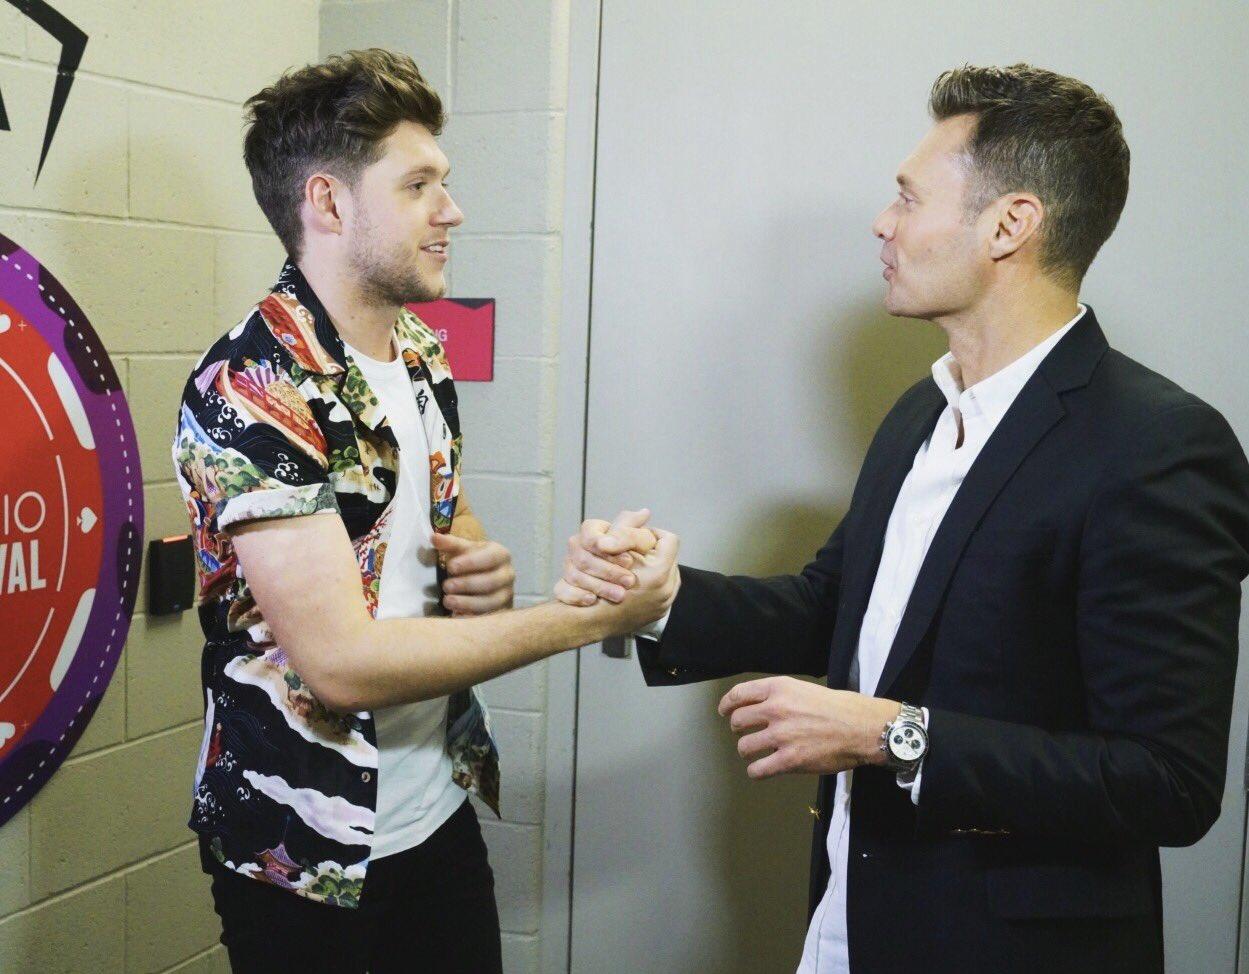 A slow handshake for good luck @NiallOfficial #iheartfestival https://t.co/7TlfPj5OeE